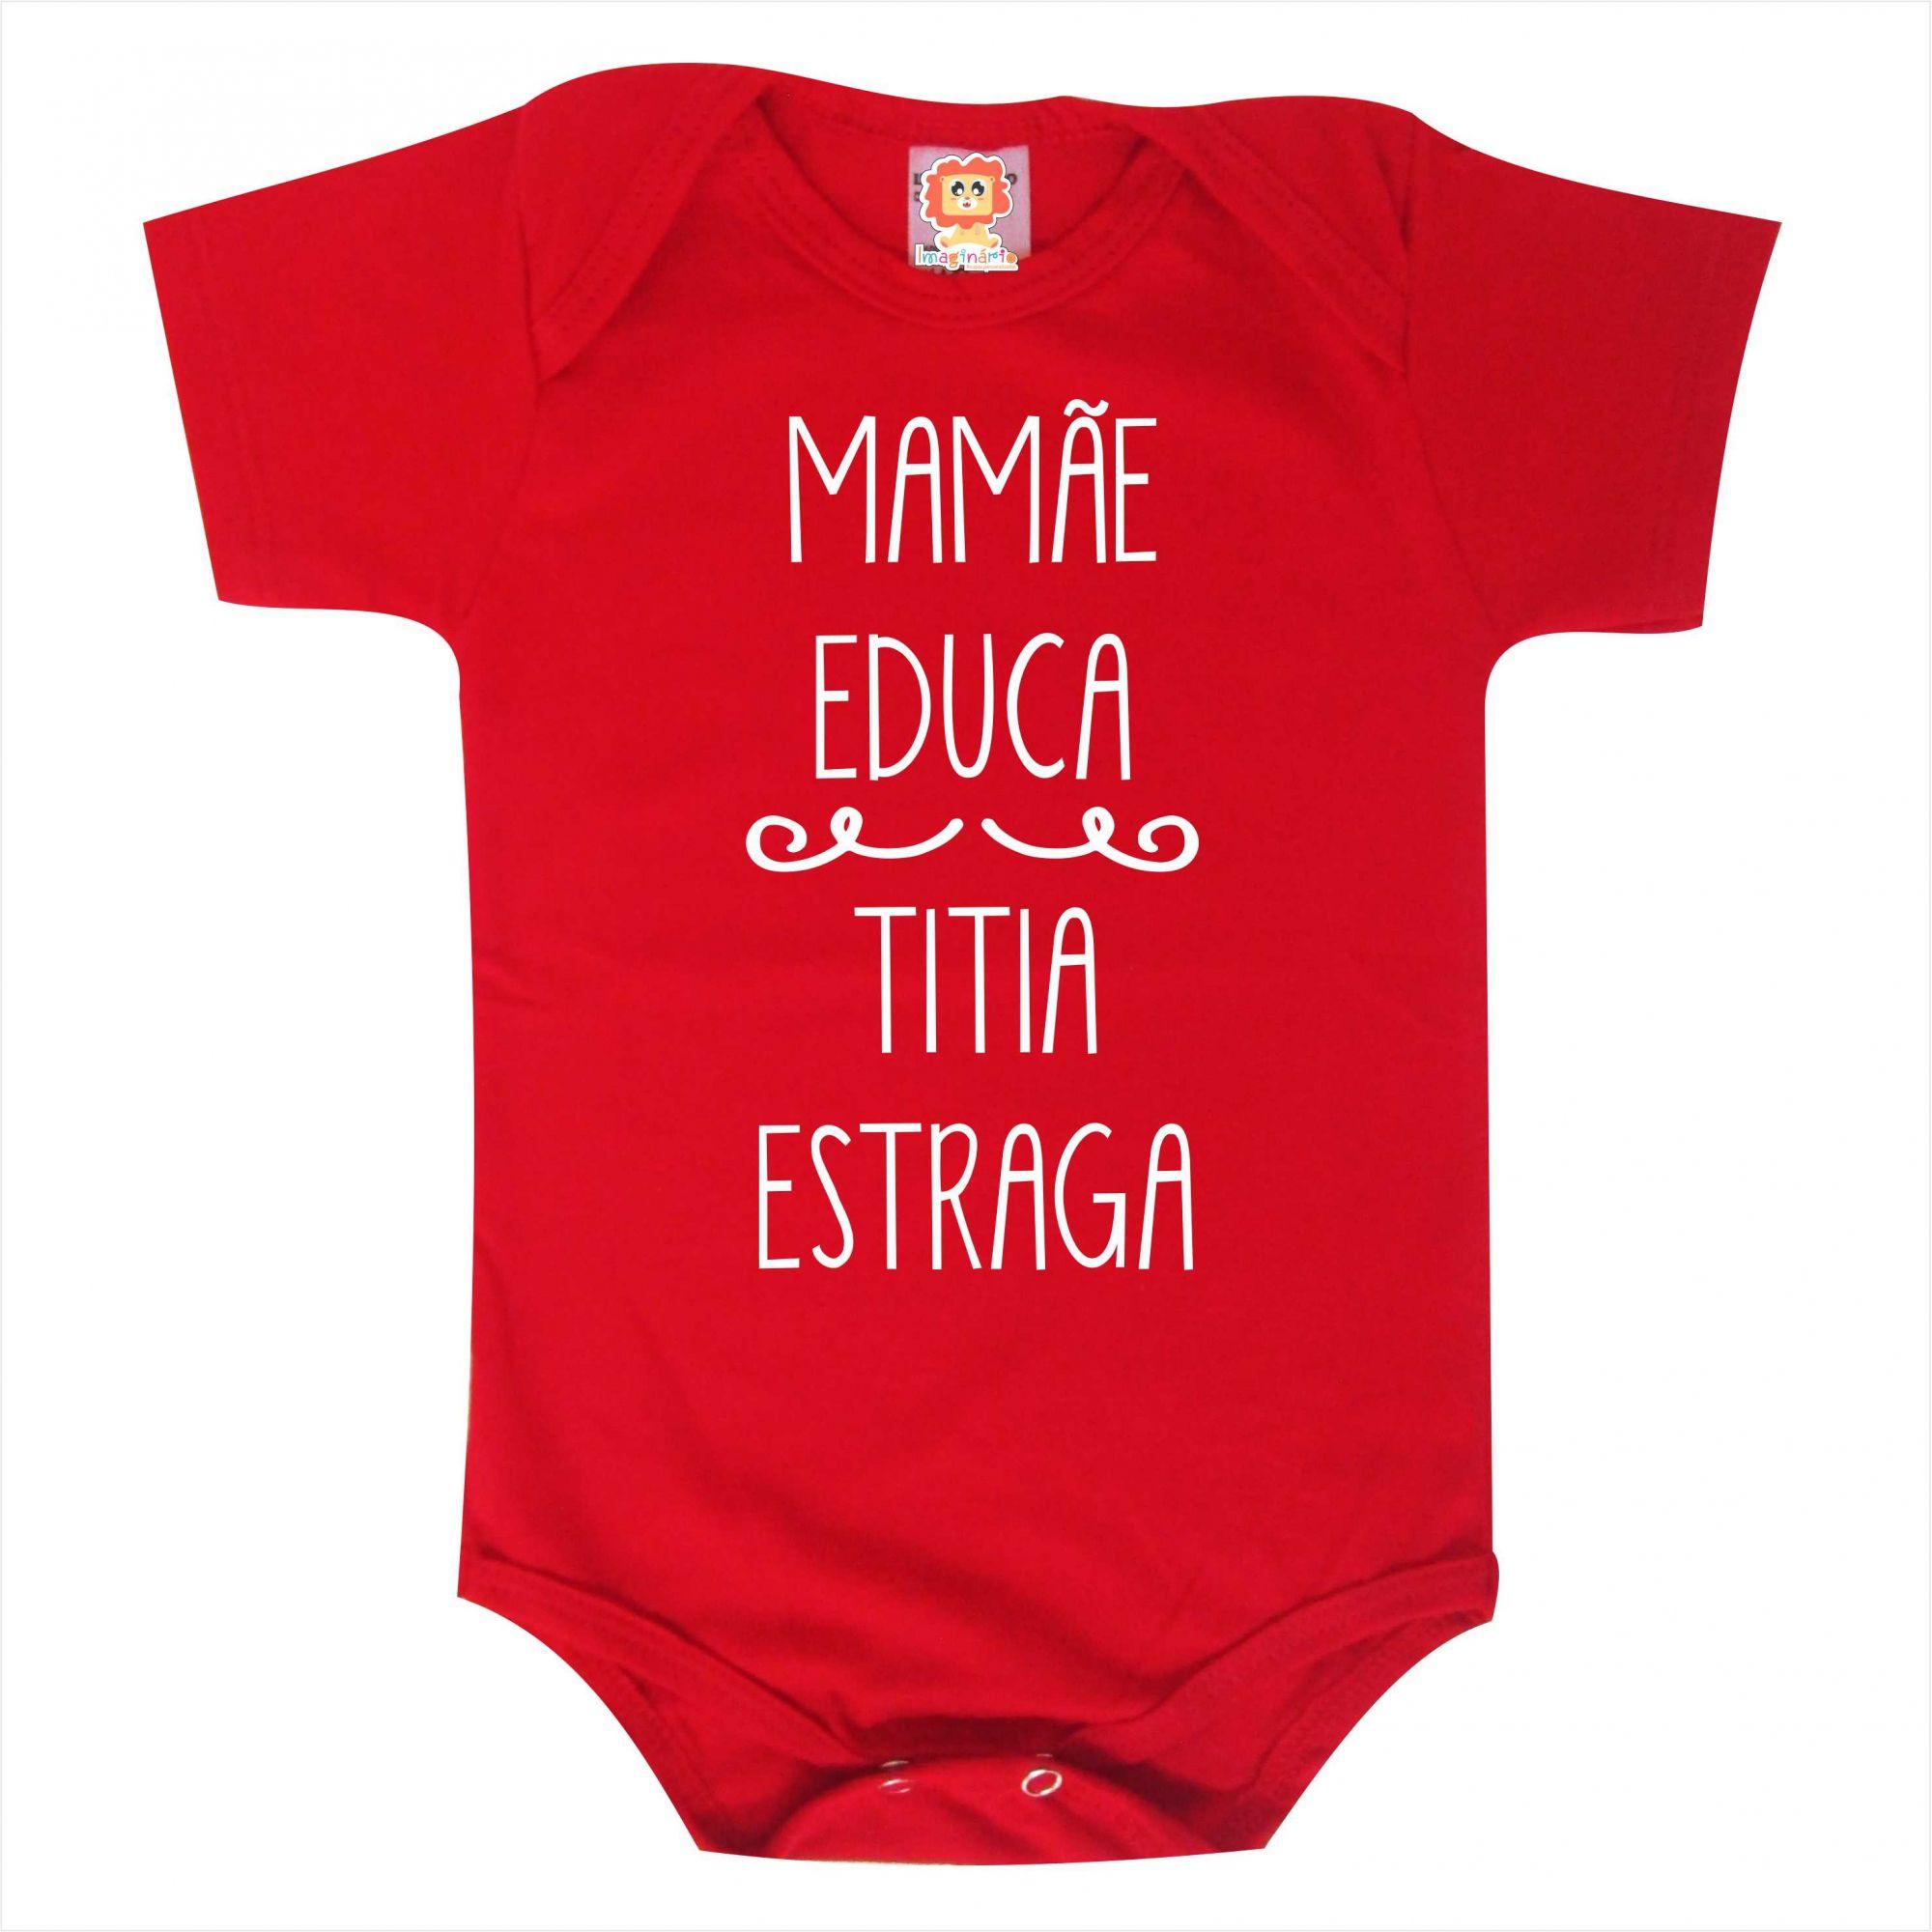 Body ou Camiseta Mamãe Educa e Titia Estraga